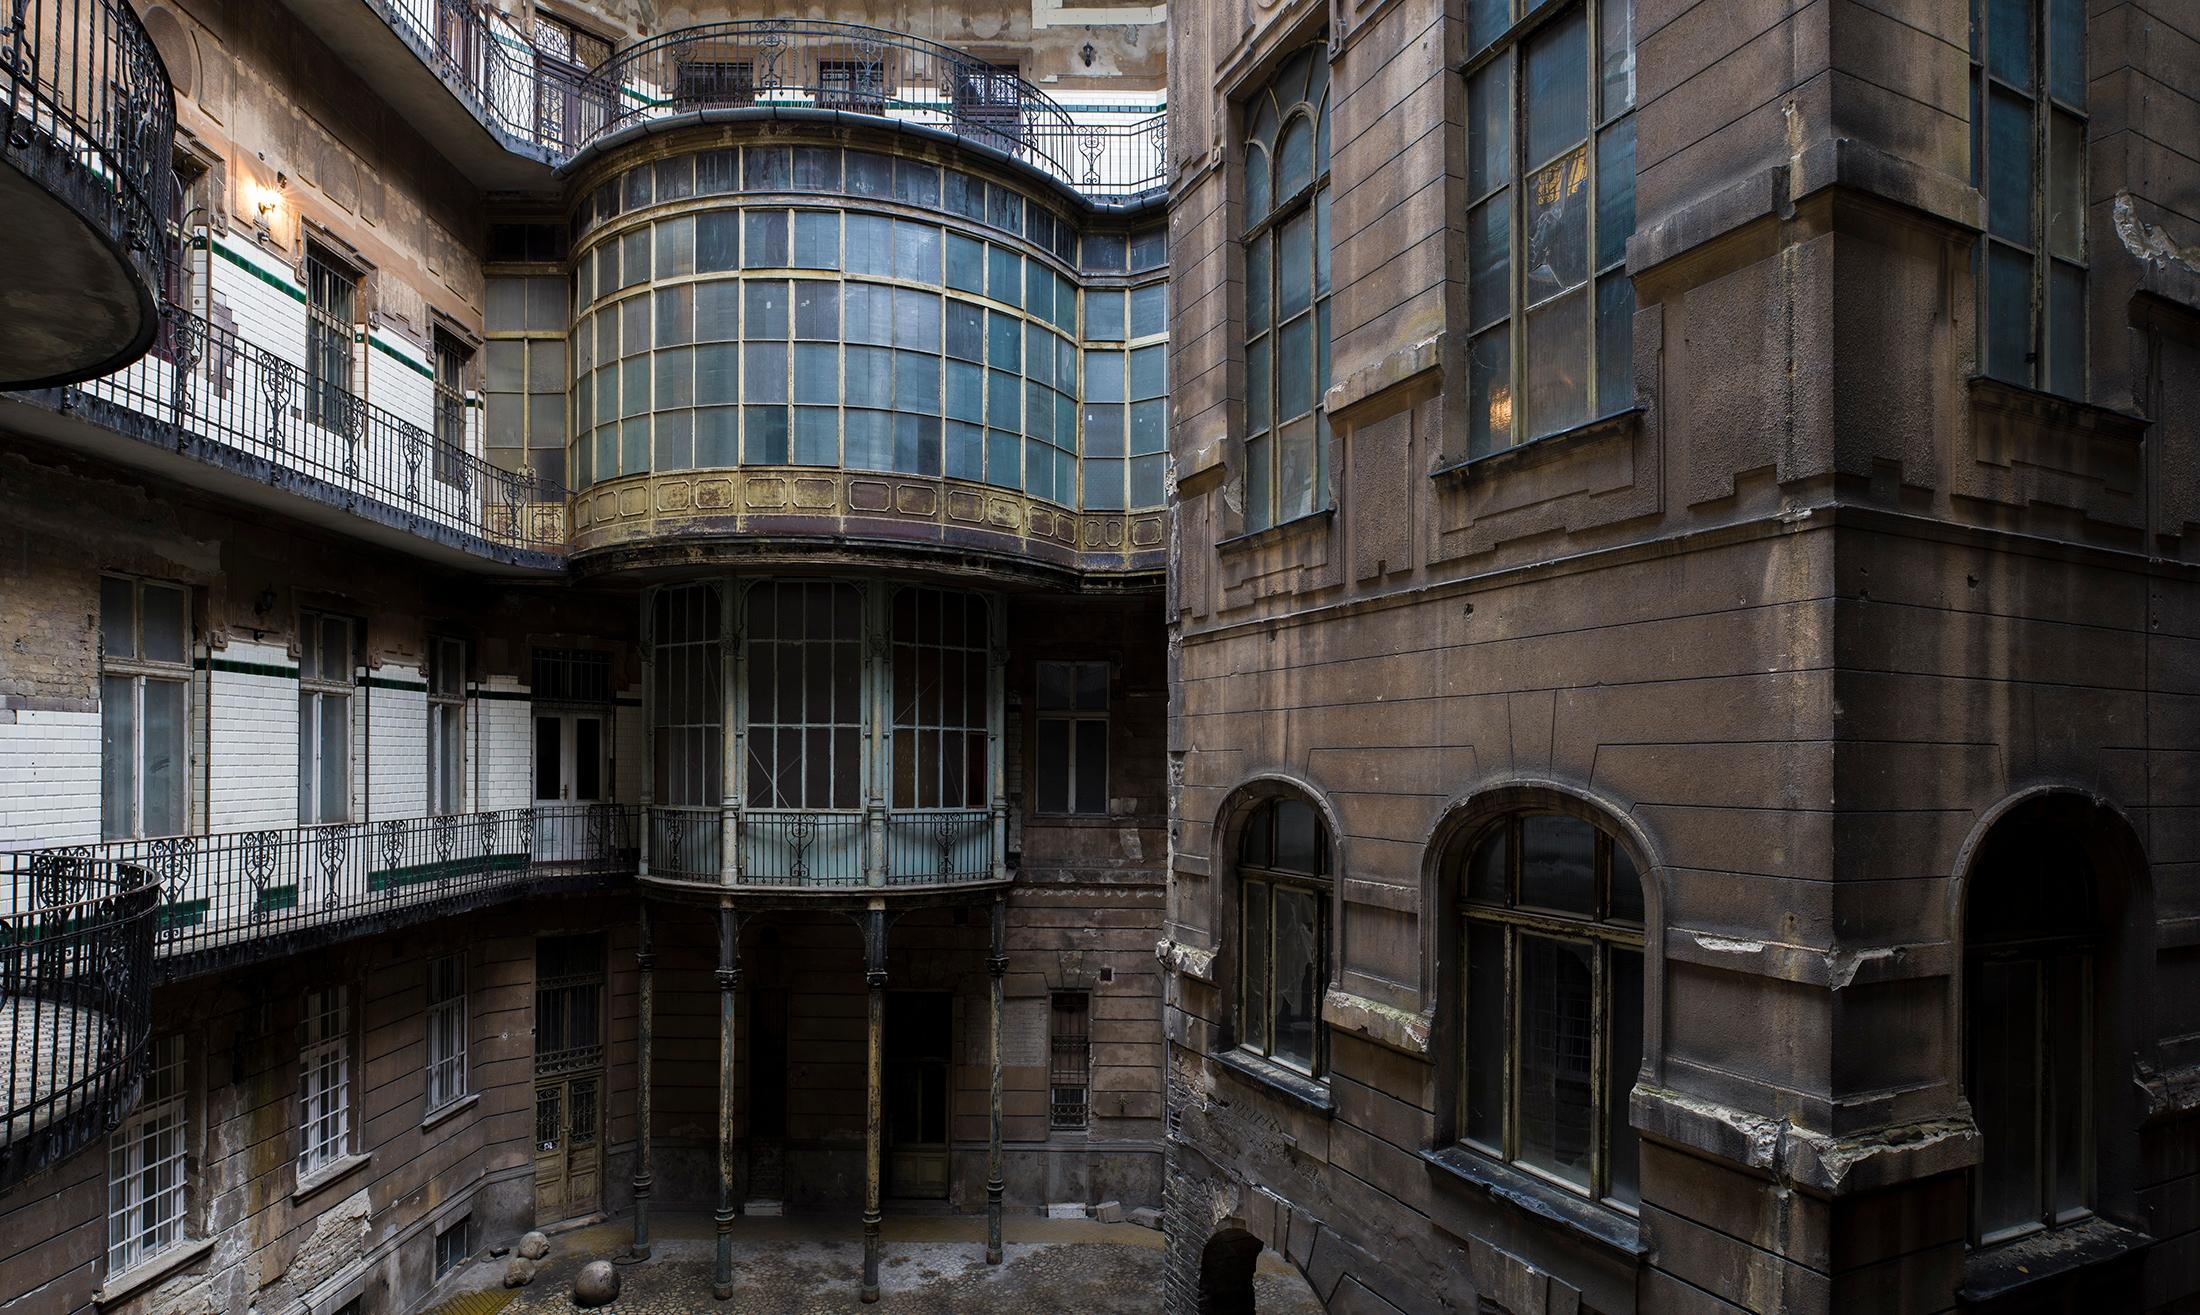 Art nouveau courtyard Hungary.  - forgottenheritage   ello